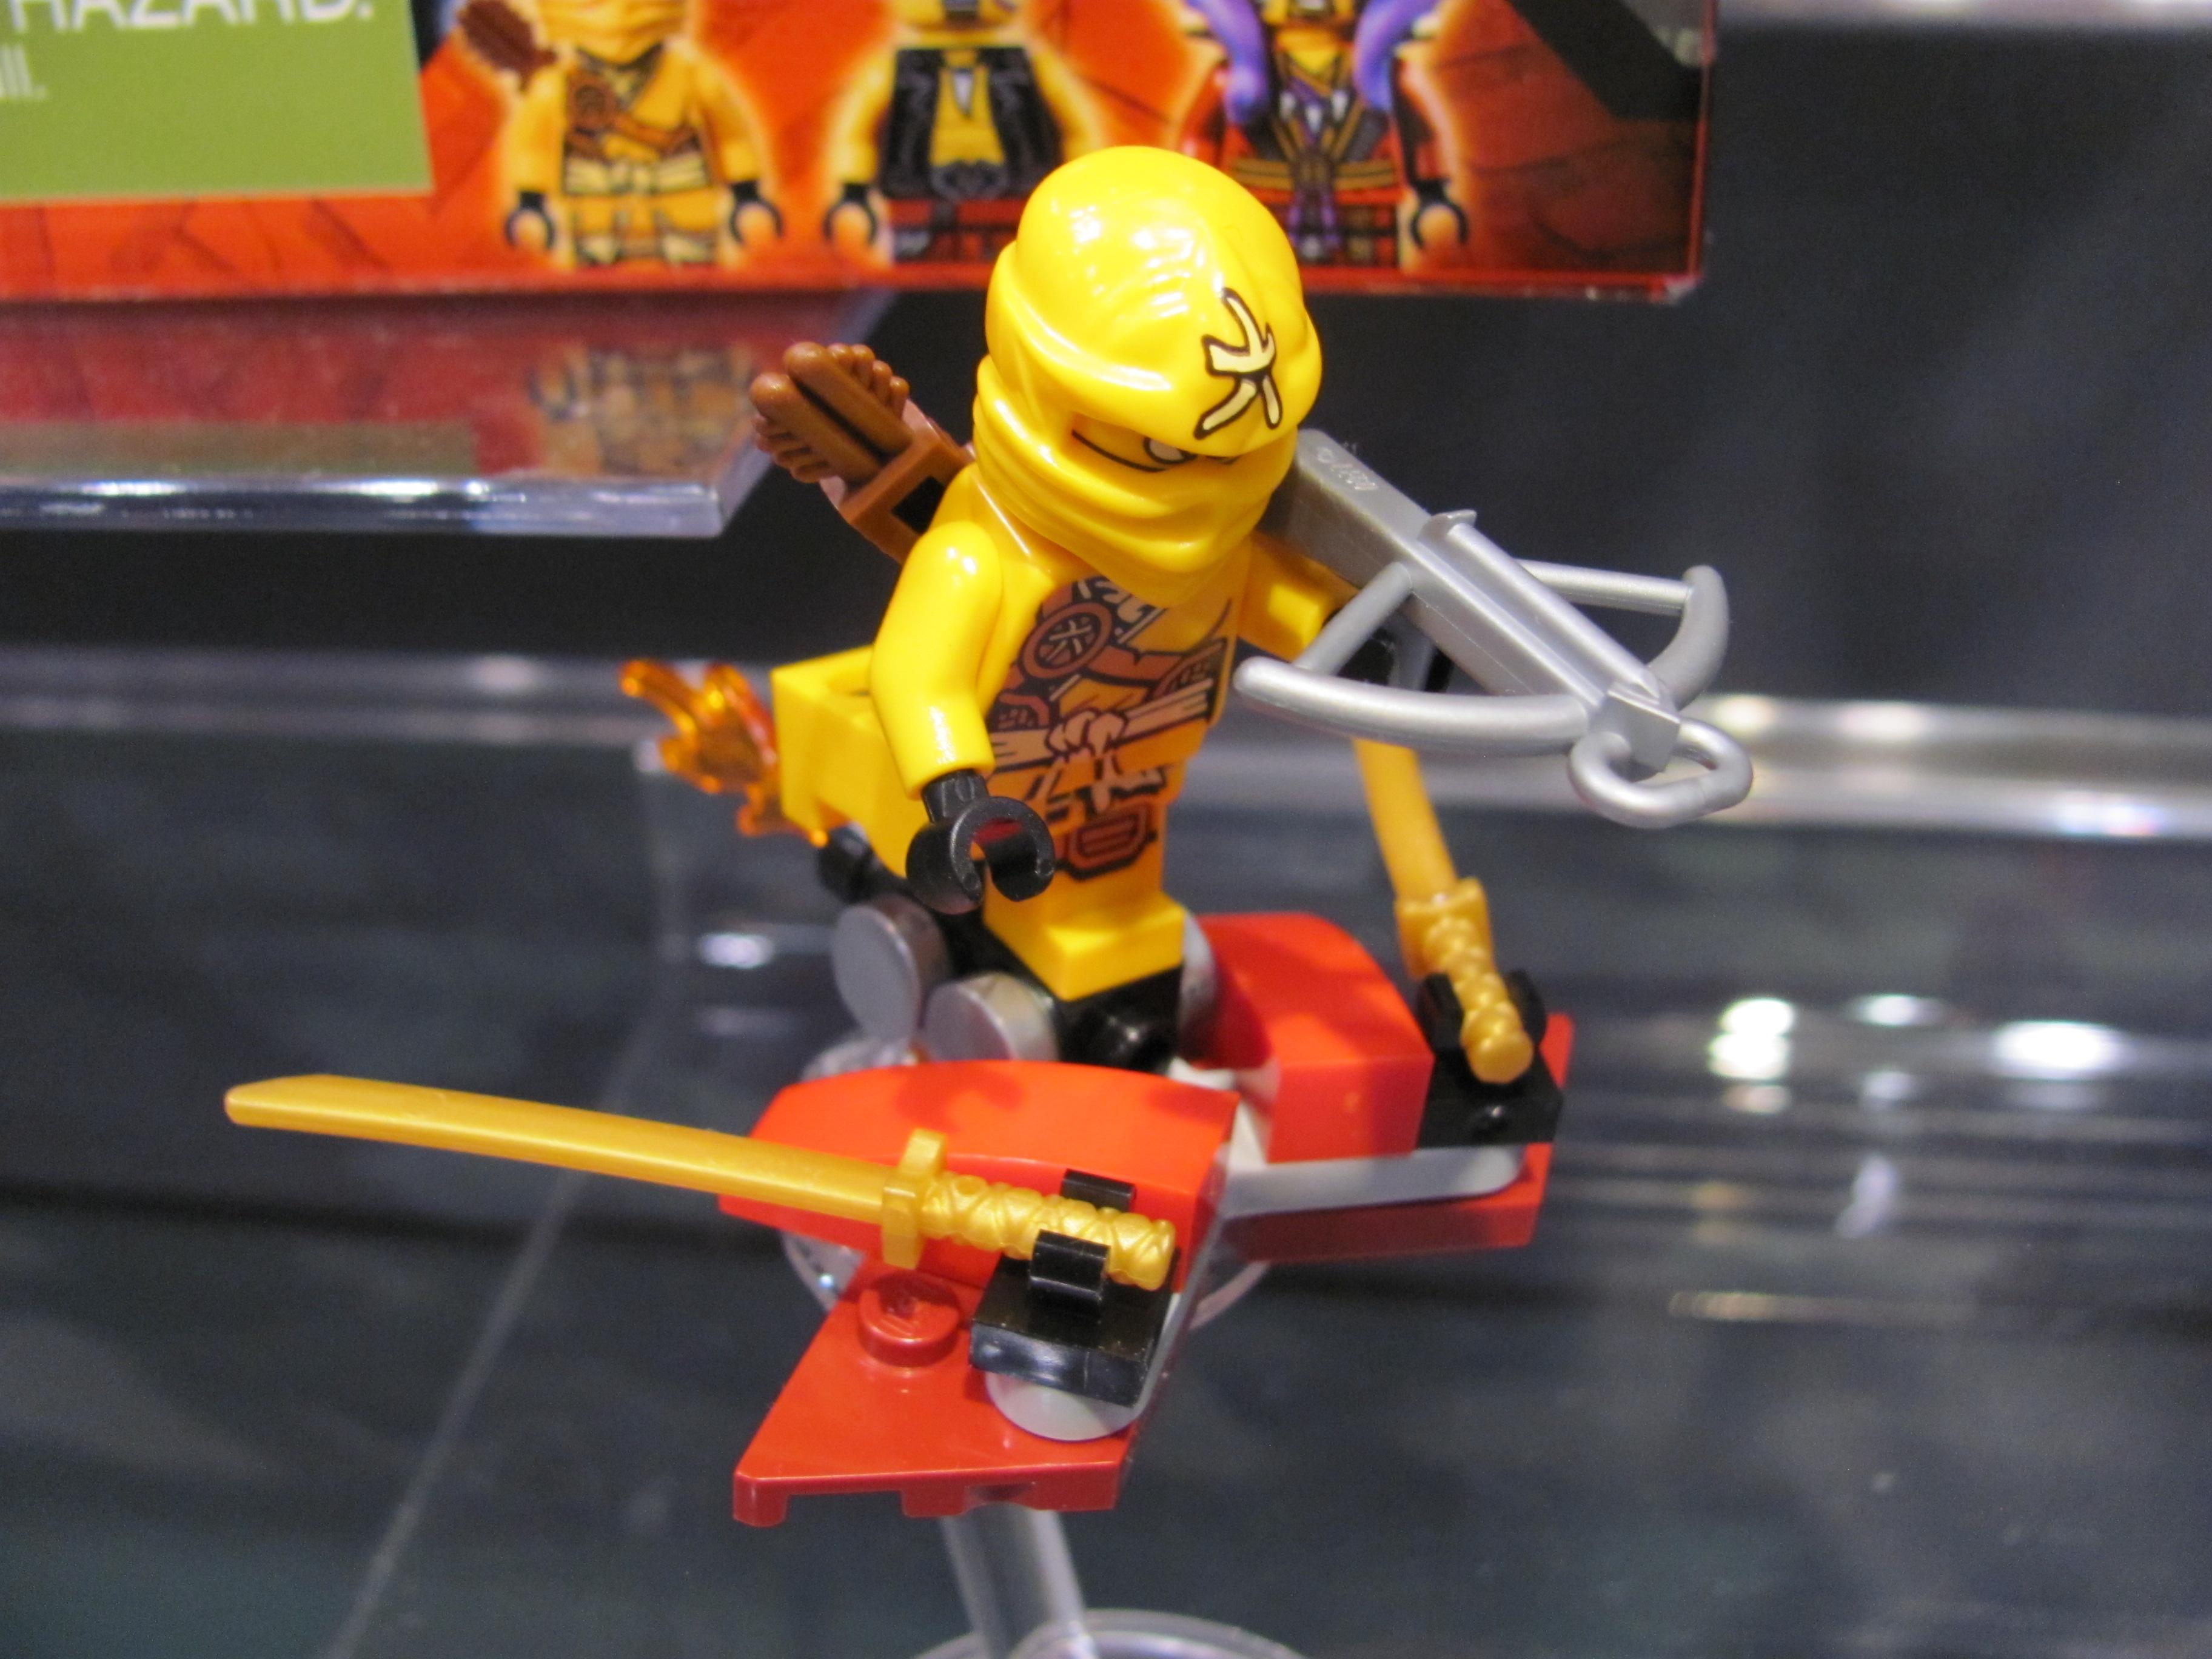 Lego Ninja Toys : Toy fair —lego legends of chima and ninjago purple pawn